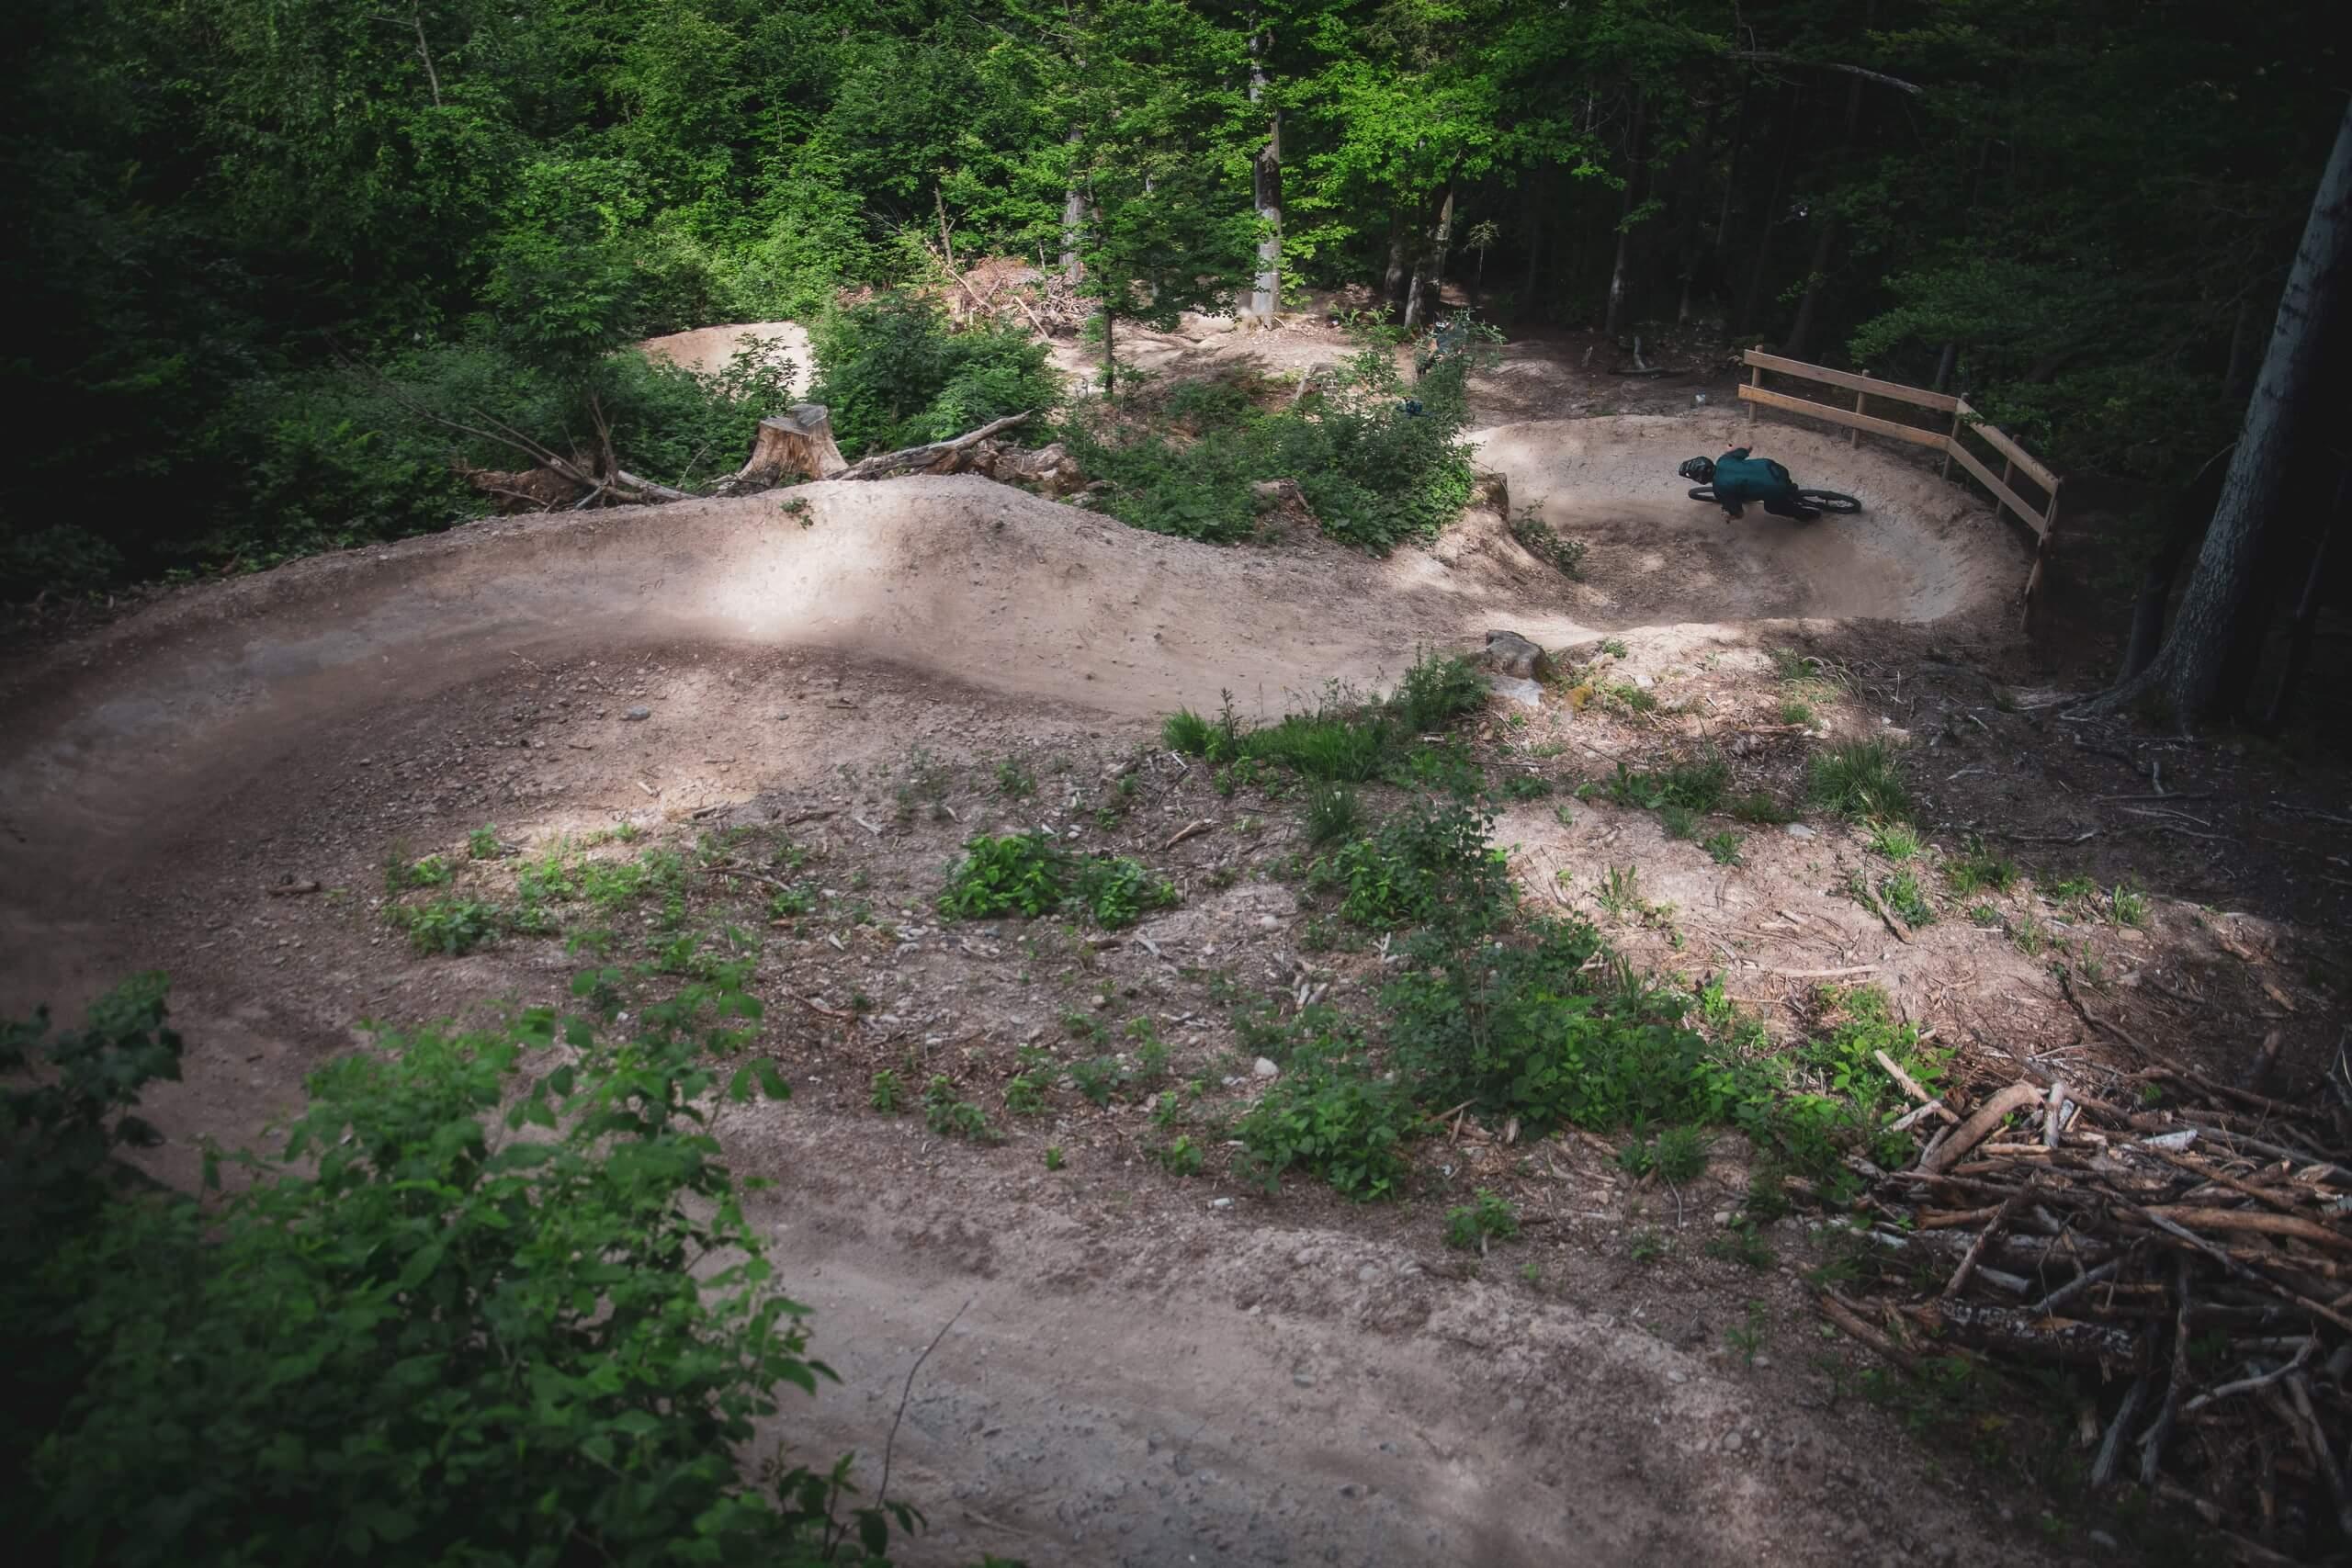 rabenfluhtrail-bikepark-thunersee-downhill-kurven-wald